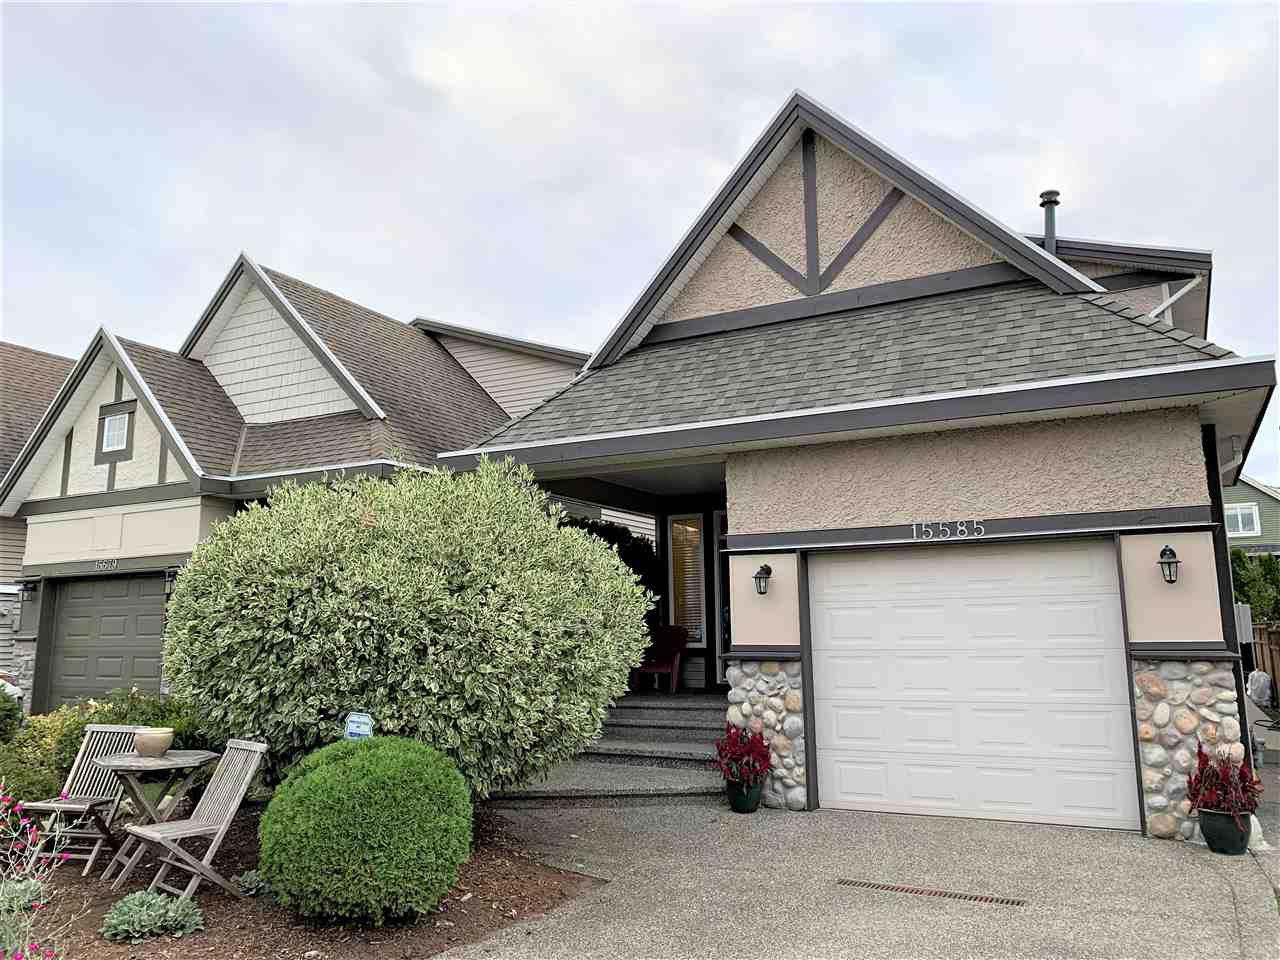 Main Photo: 15585 GOGGS Avenue: White Rock House for sale (South Surrey White Rock)  : MLS®# R2514789